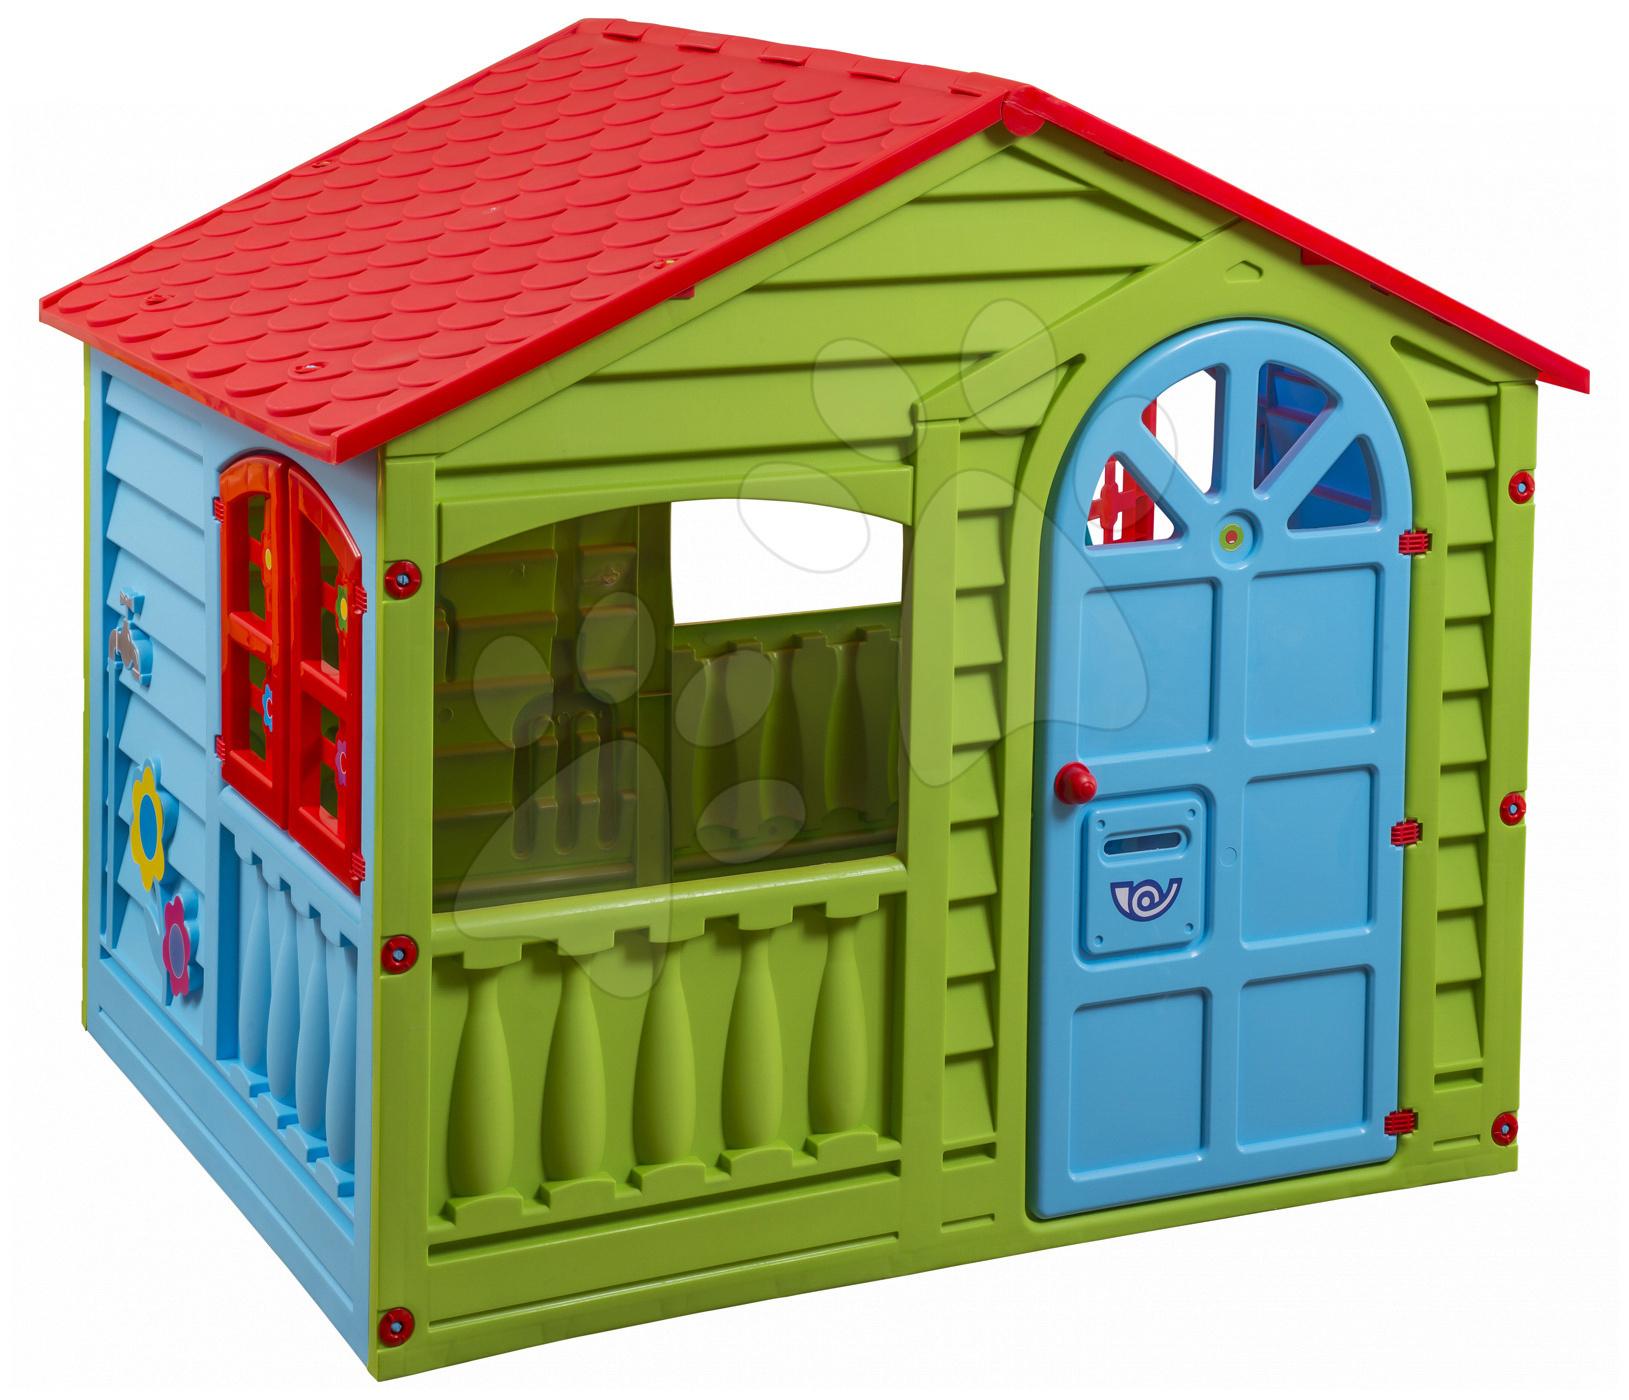 Domčeky pre deti - Domček Happy House PalPlay zeleno-modrý od 24 mes